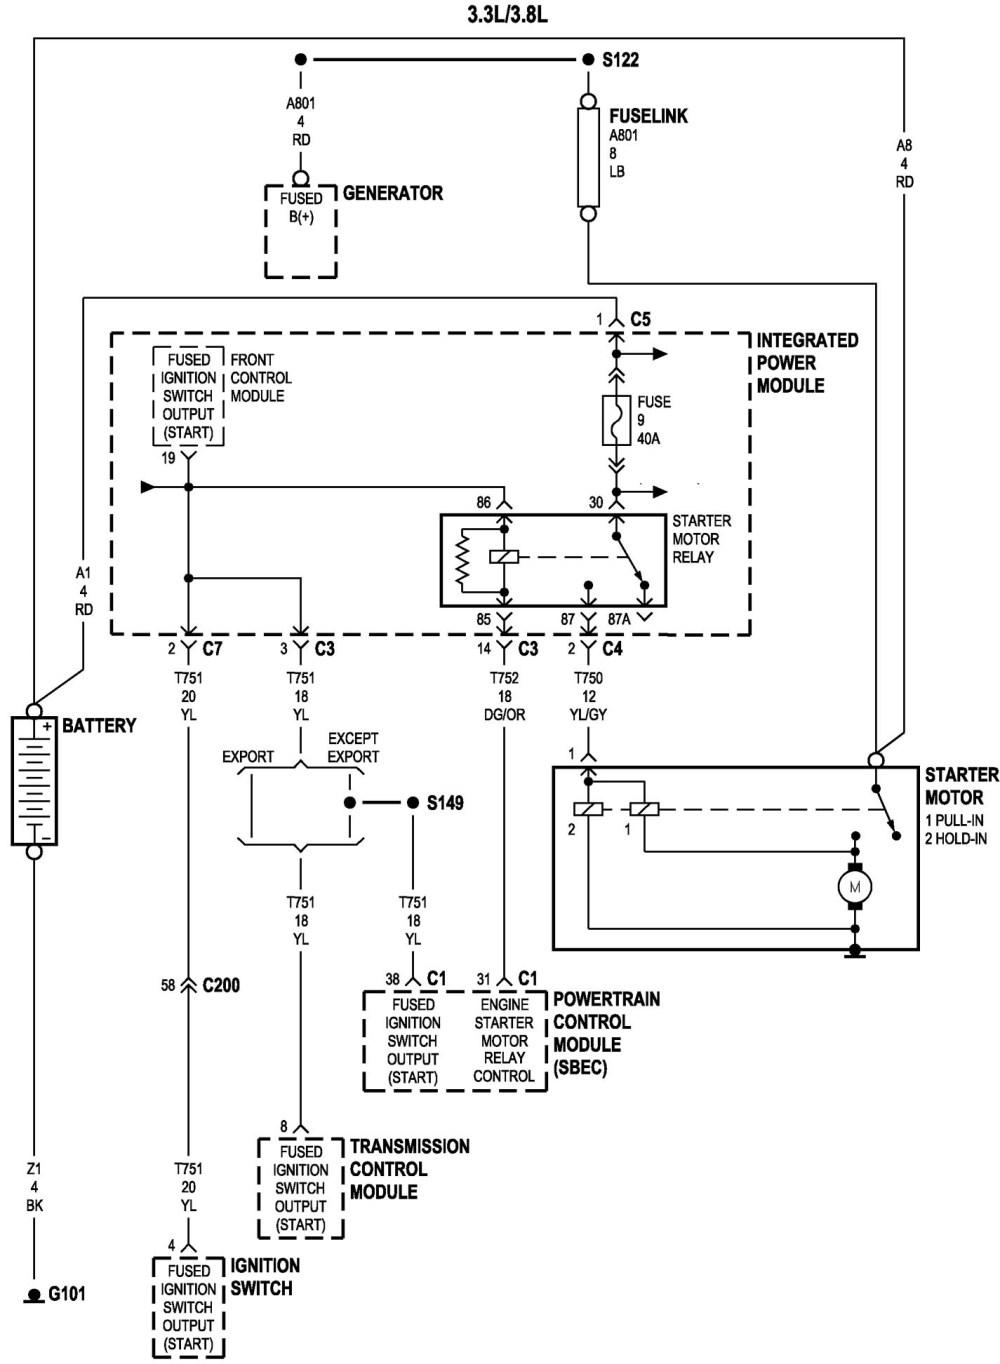 medium resolution of 2002 dodge grand caravan ac wiring diagram introduction to msd ignition wiring diagram chevy 2001 caravan